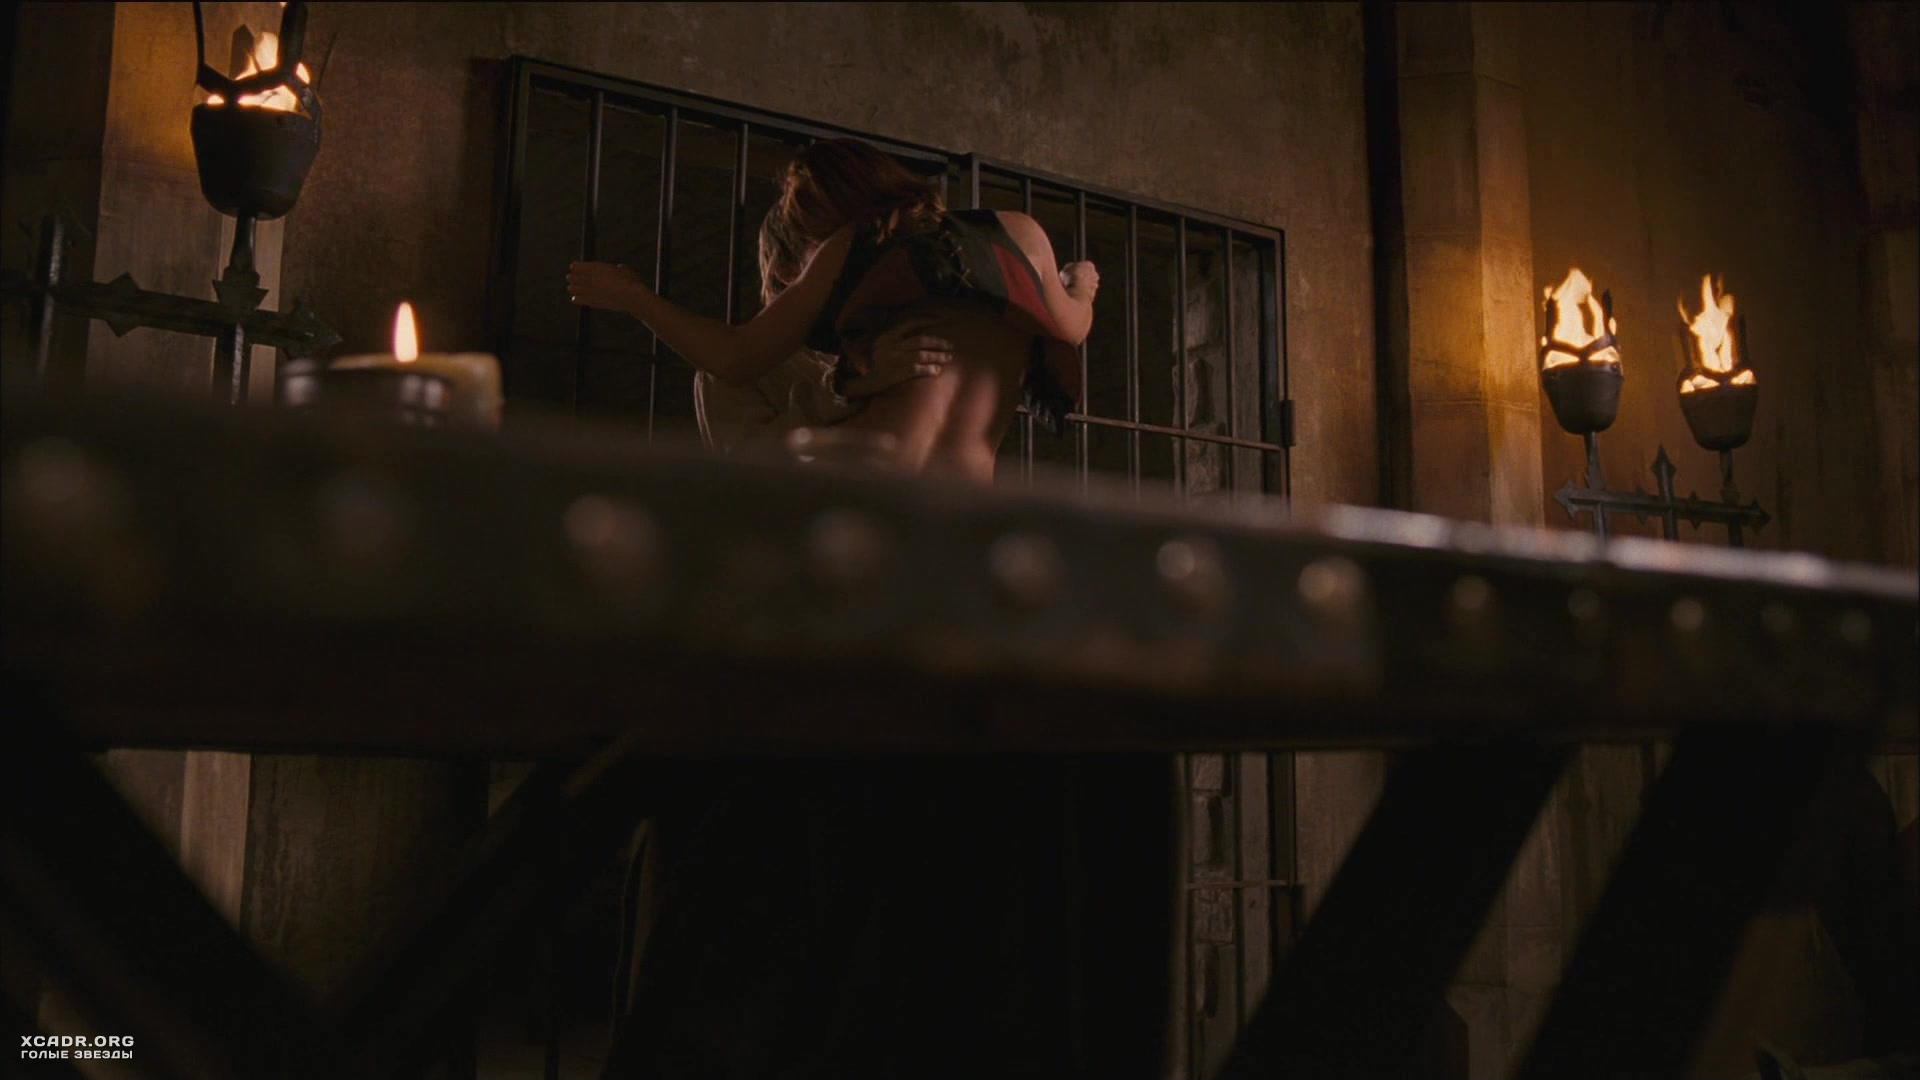 bloodrayne-nude-scene-my-desi-teen-girl-nude-fuck-photo